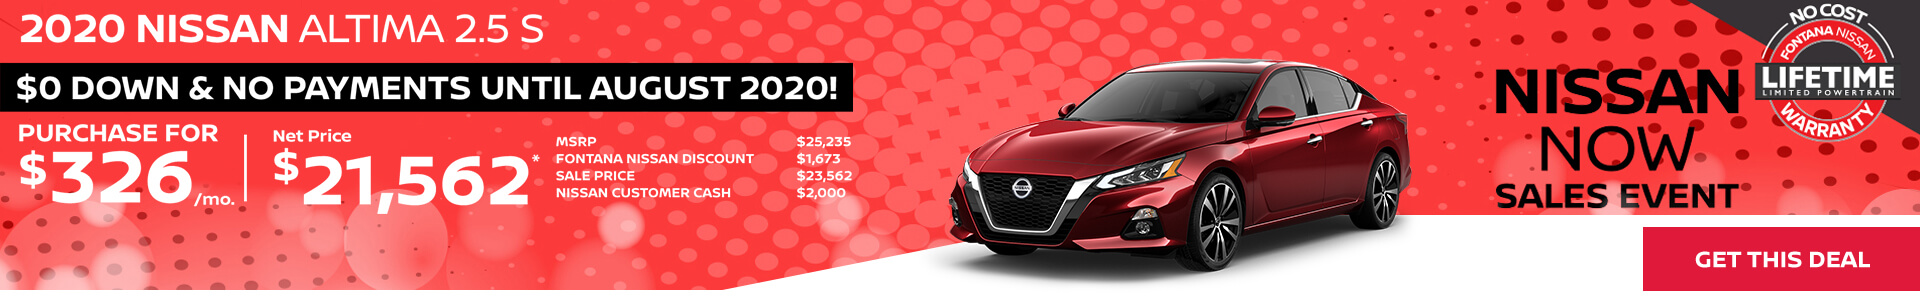 Nissan Altima $326